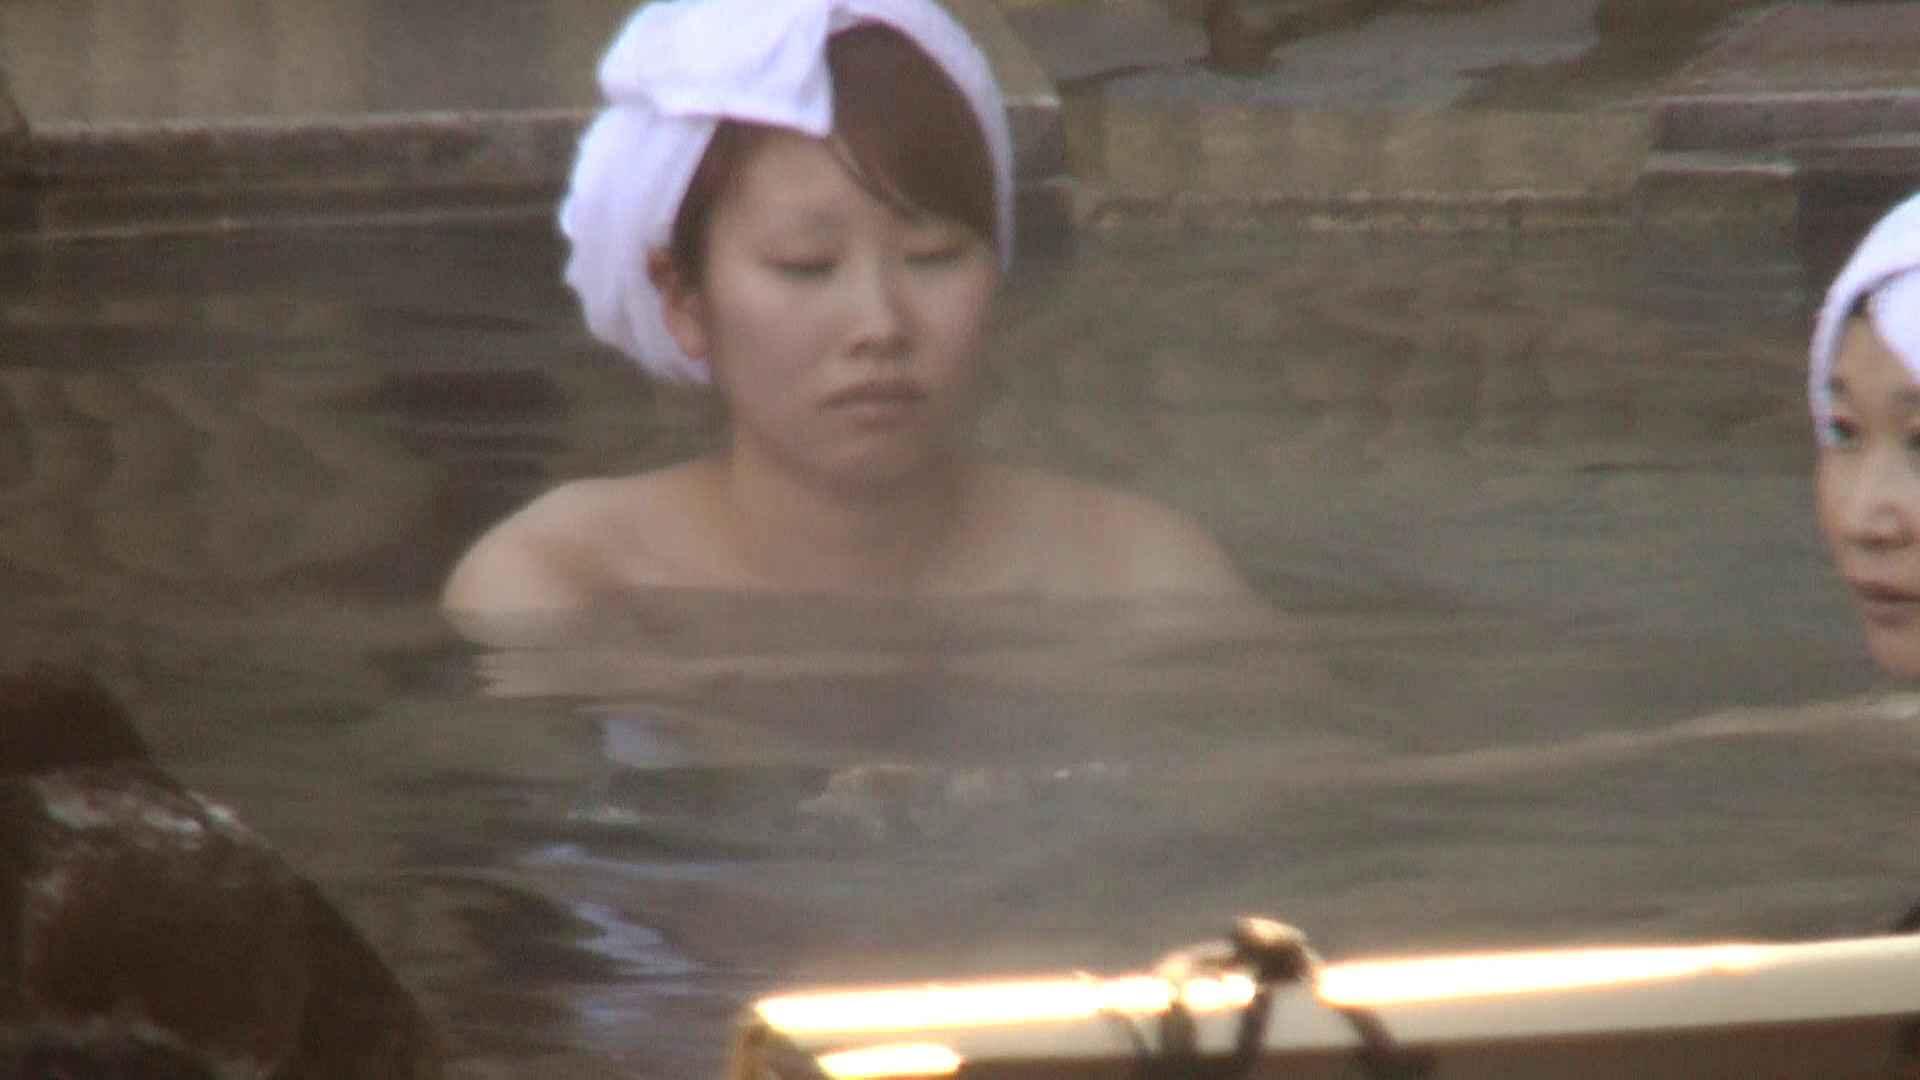 Aquaな露天風呂Vol.210 OL女体  49連発 24